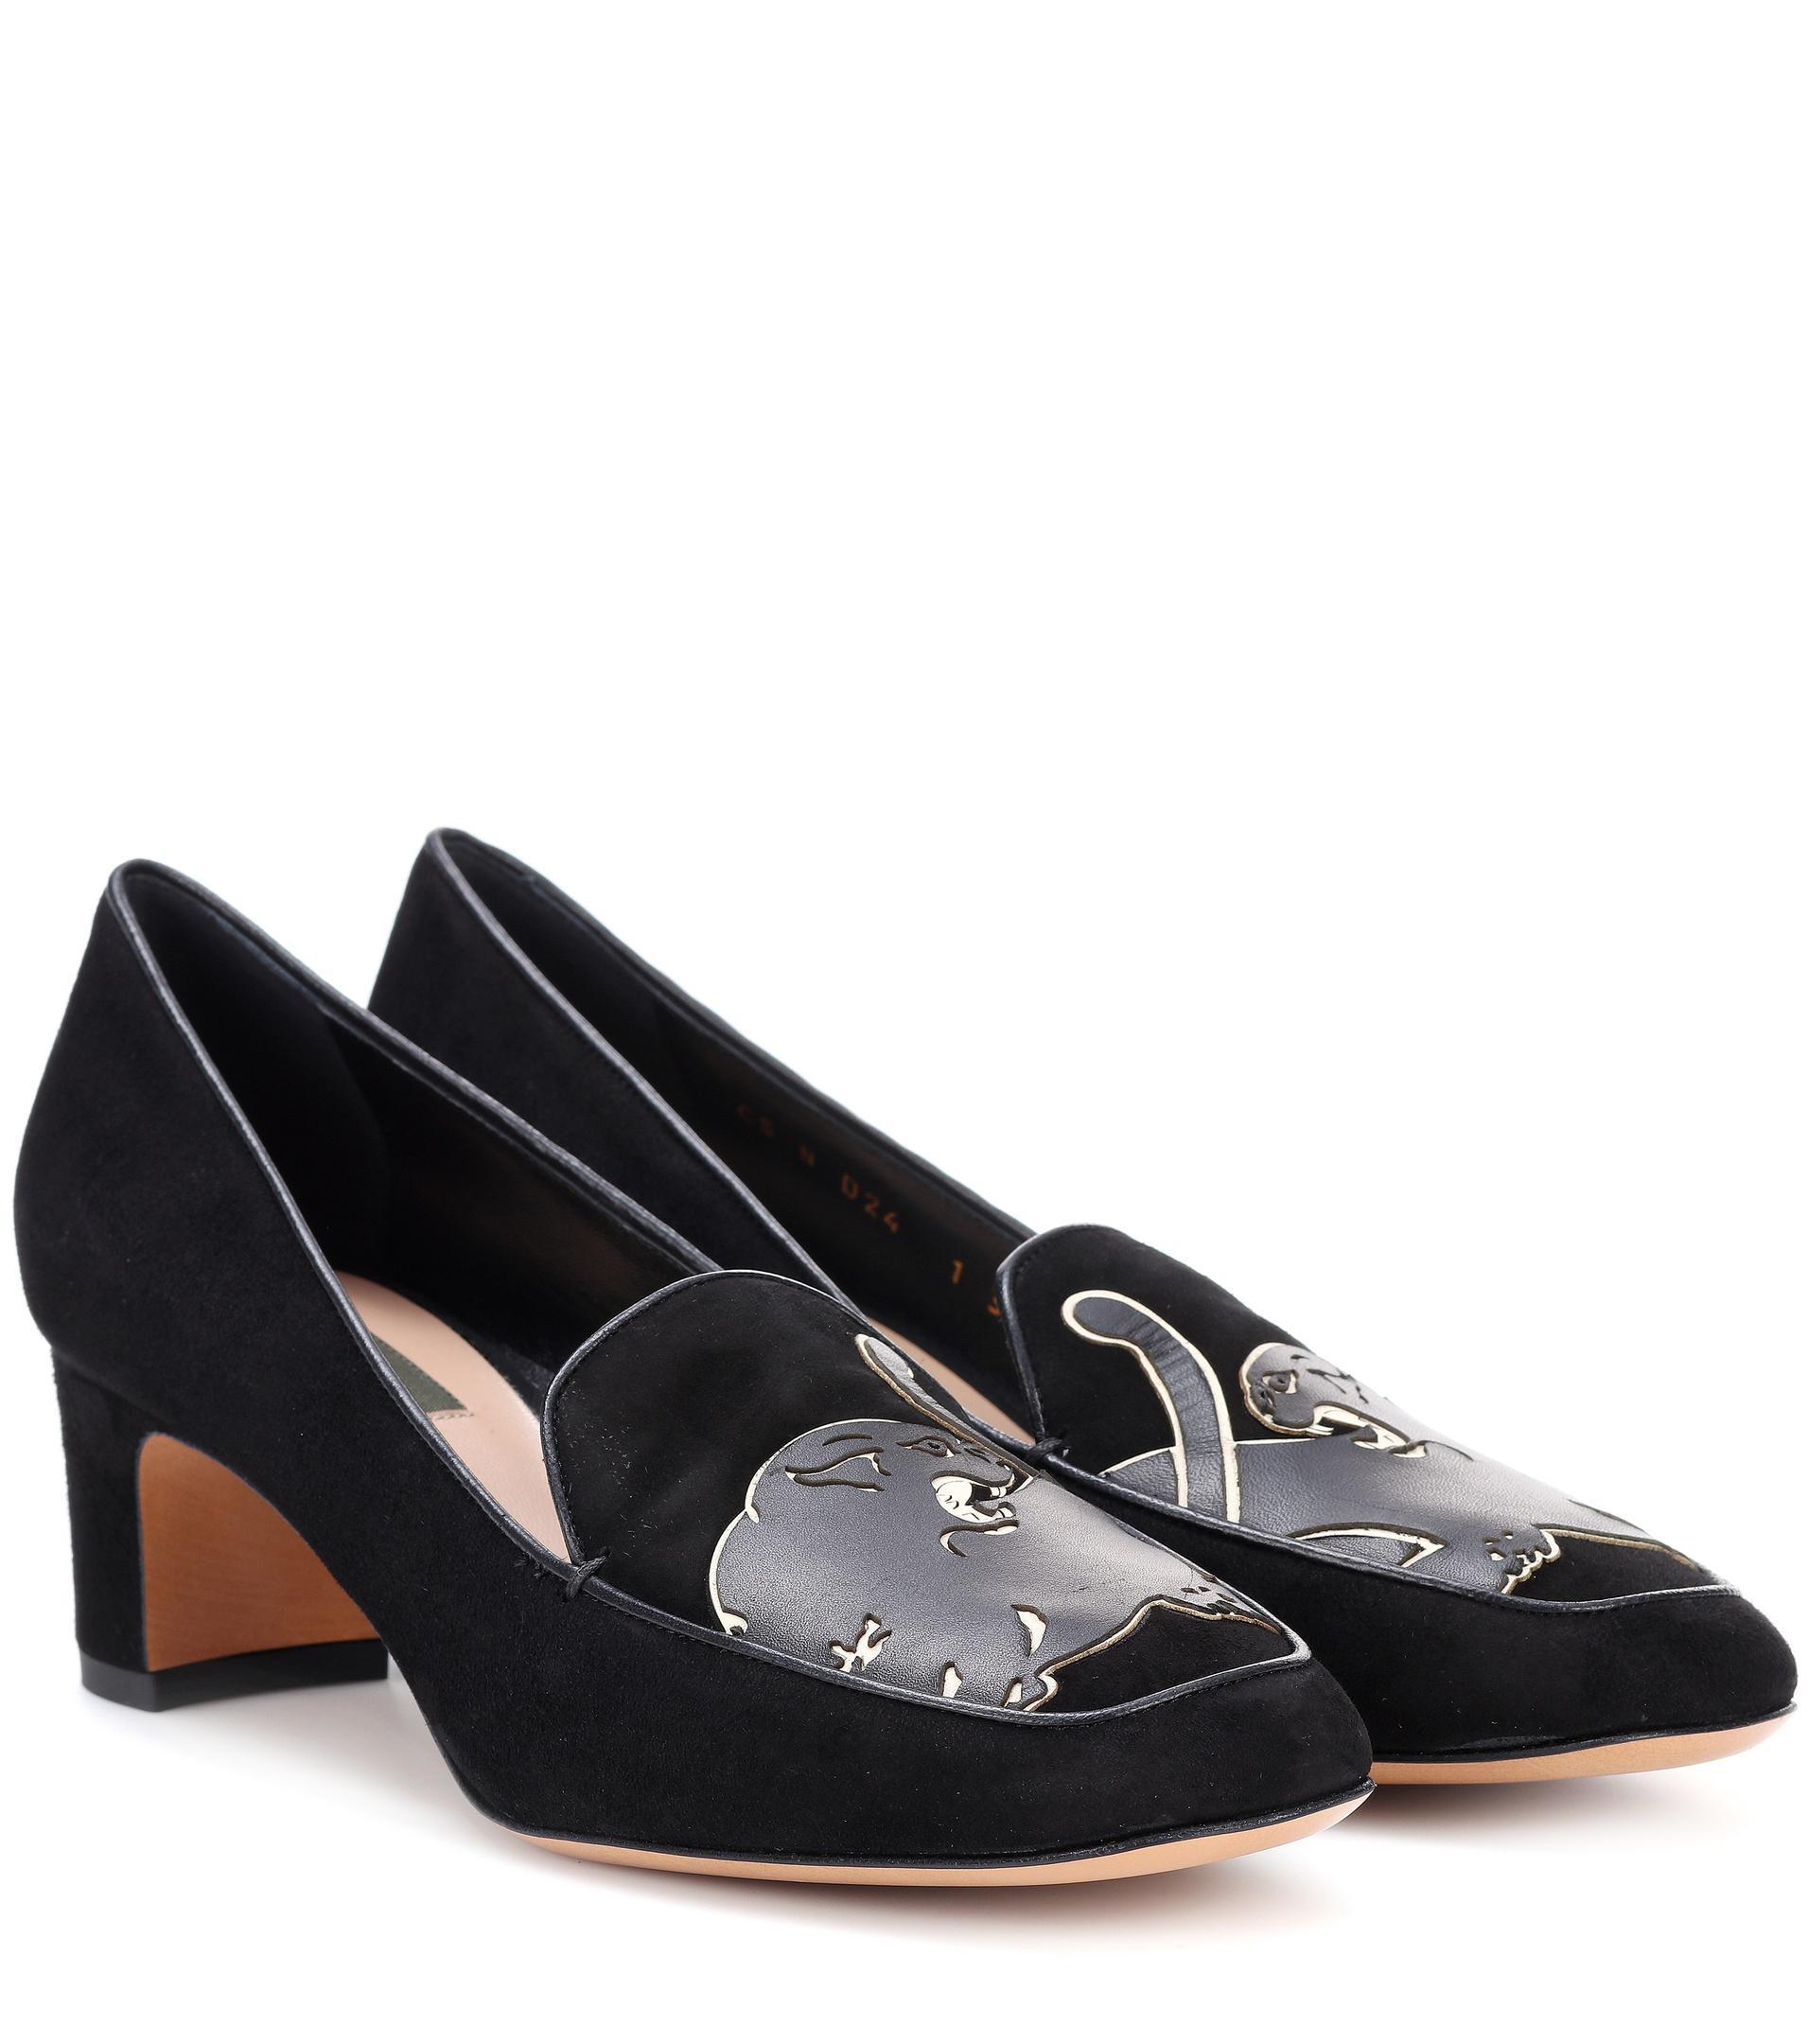 Black Snakeskin Court Shoes